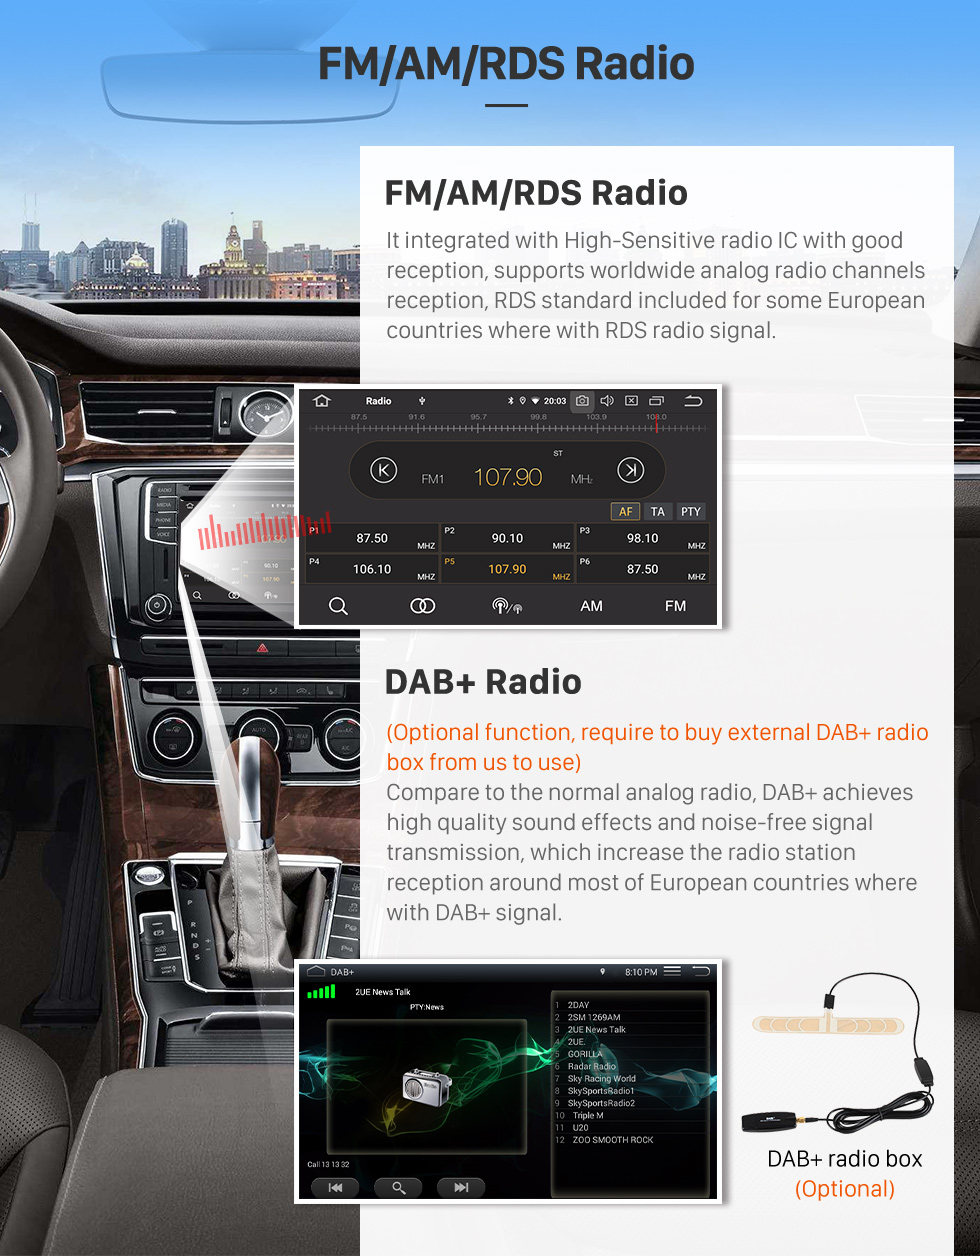 Seicane 9 polegadas 2013 2014 Peugeot 301 Citroën Elysee Citroën C-Elysee Android 9.0 Rádio GPS HD 1024 * 600 Touchscreen 4G WIFI Volante OBD2 Controle RDS Link Espelho Bluetooth